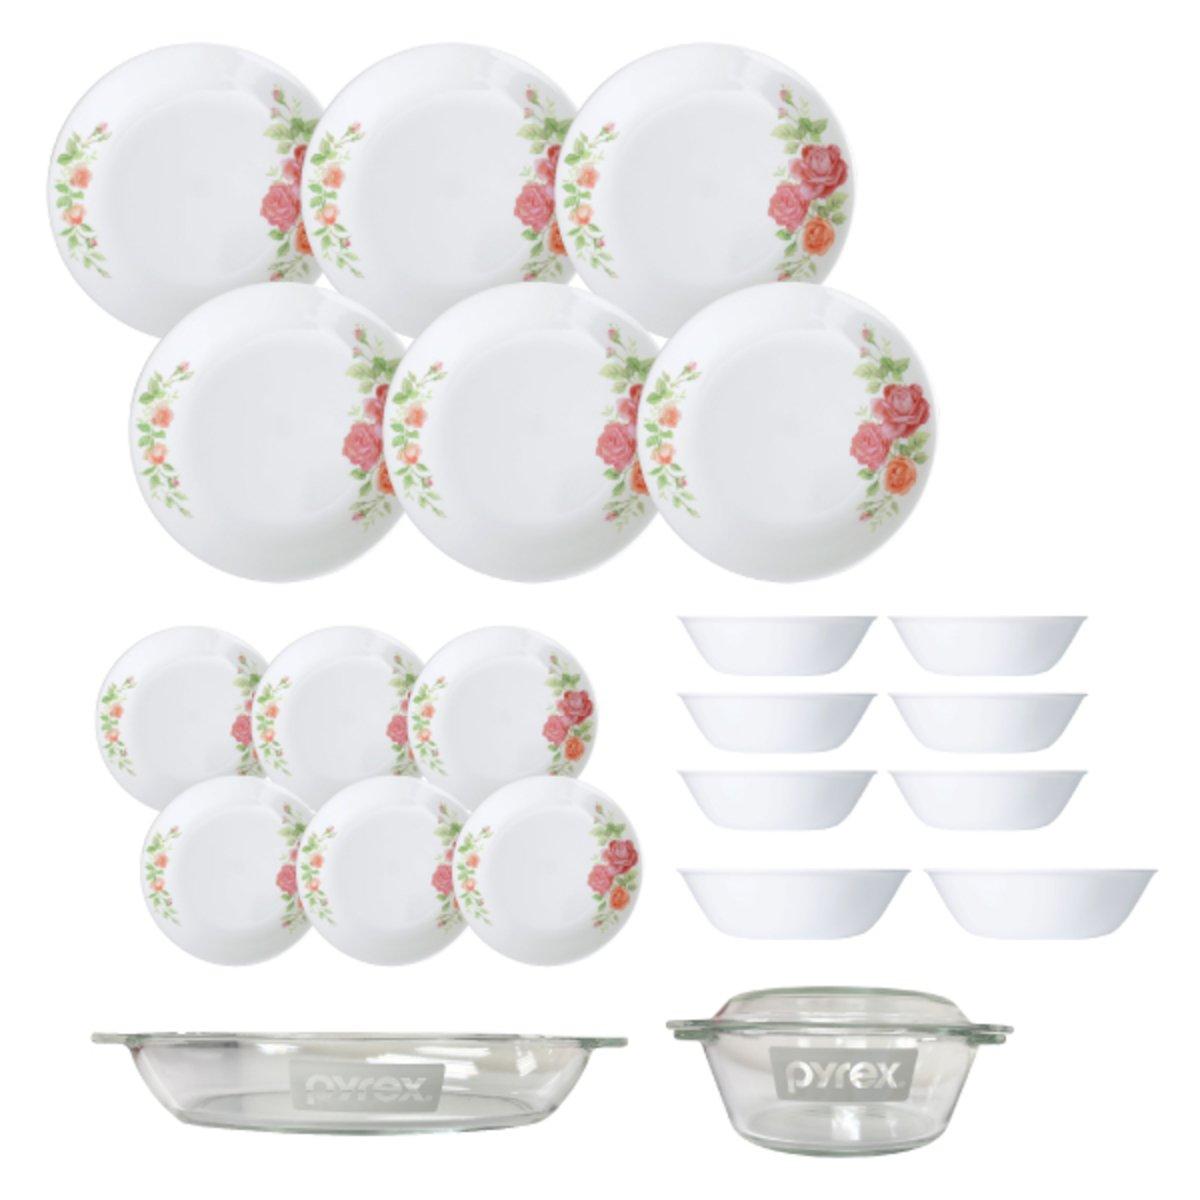 Corelle Dinnerware Set_Rosabelle  sc 1 st  Go Shop & Corelle Dinnerware Set_Rosabelle | Go Shop